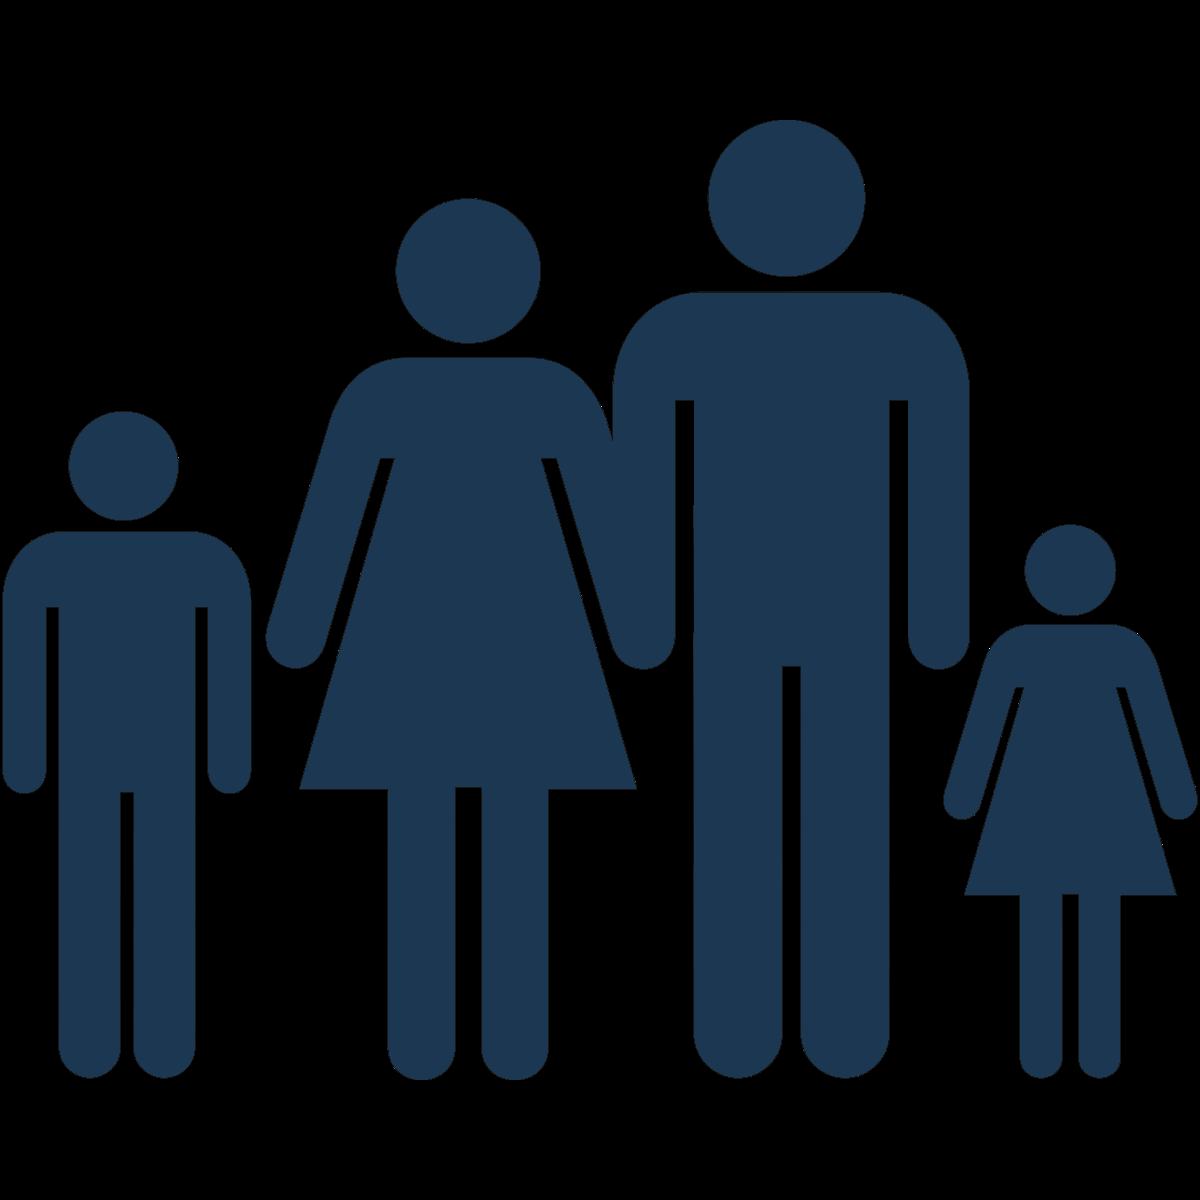 FAMILY-ICON-2-SHIELD-BLUE